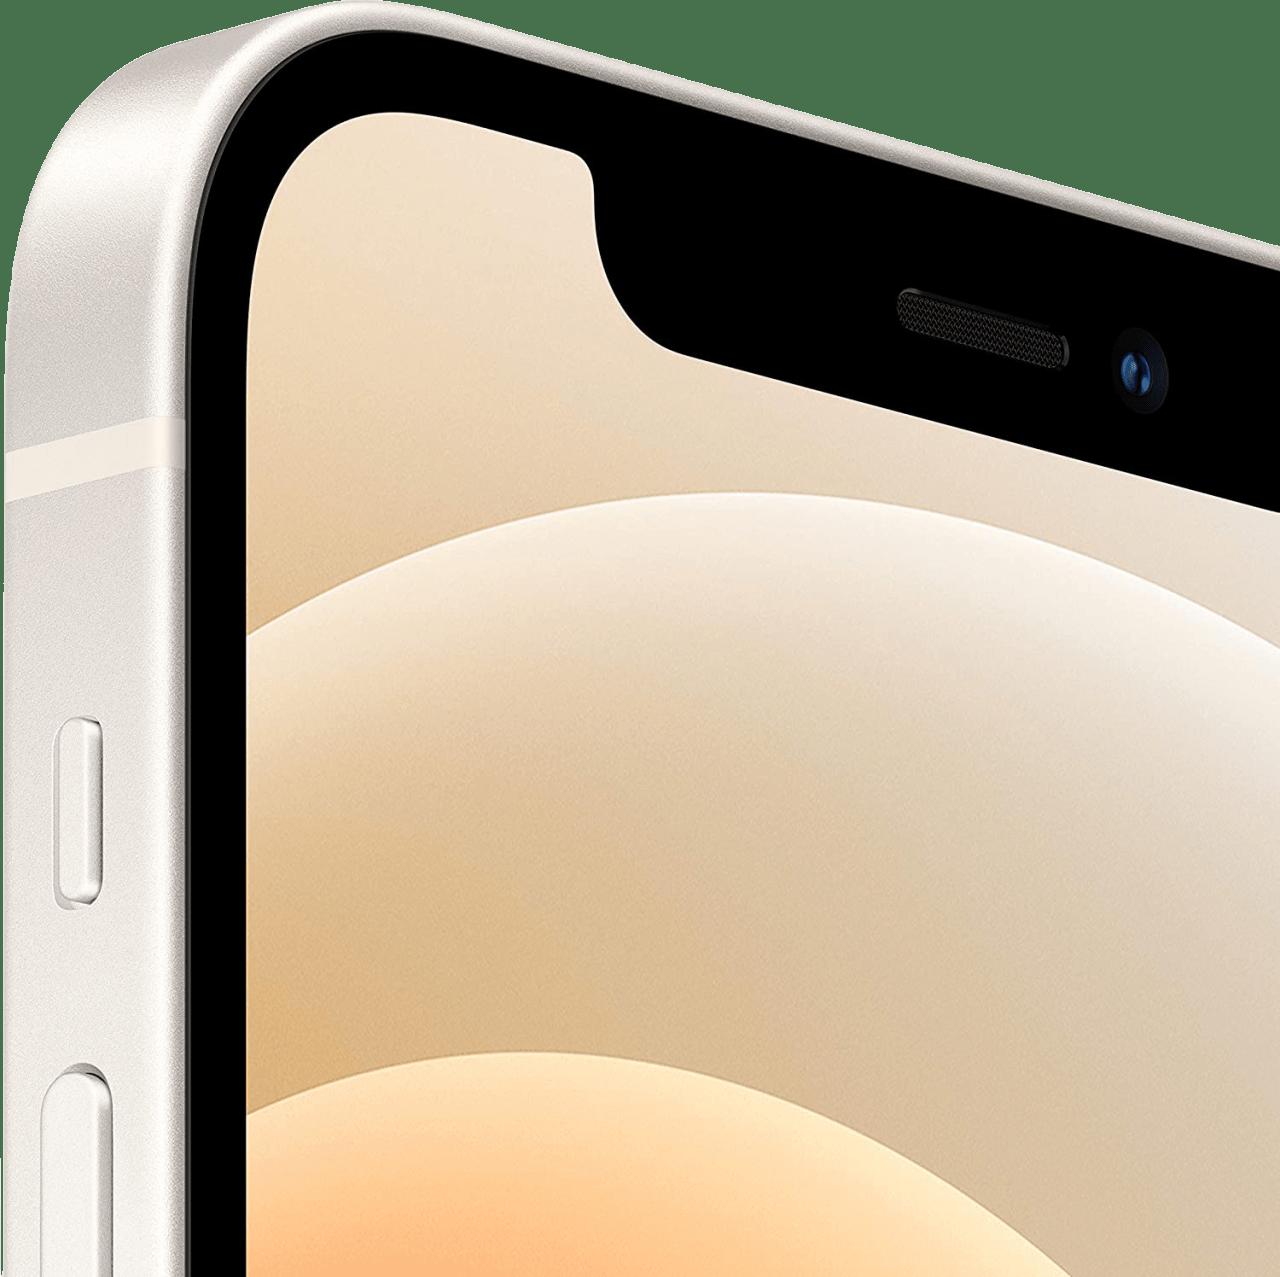 White Apple iPhone 12 mini 128GB.3